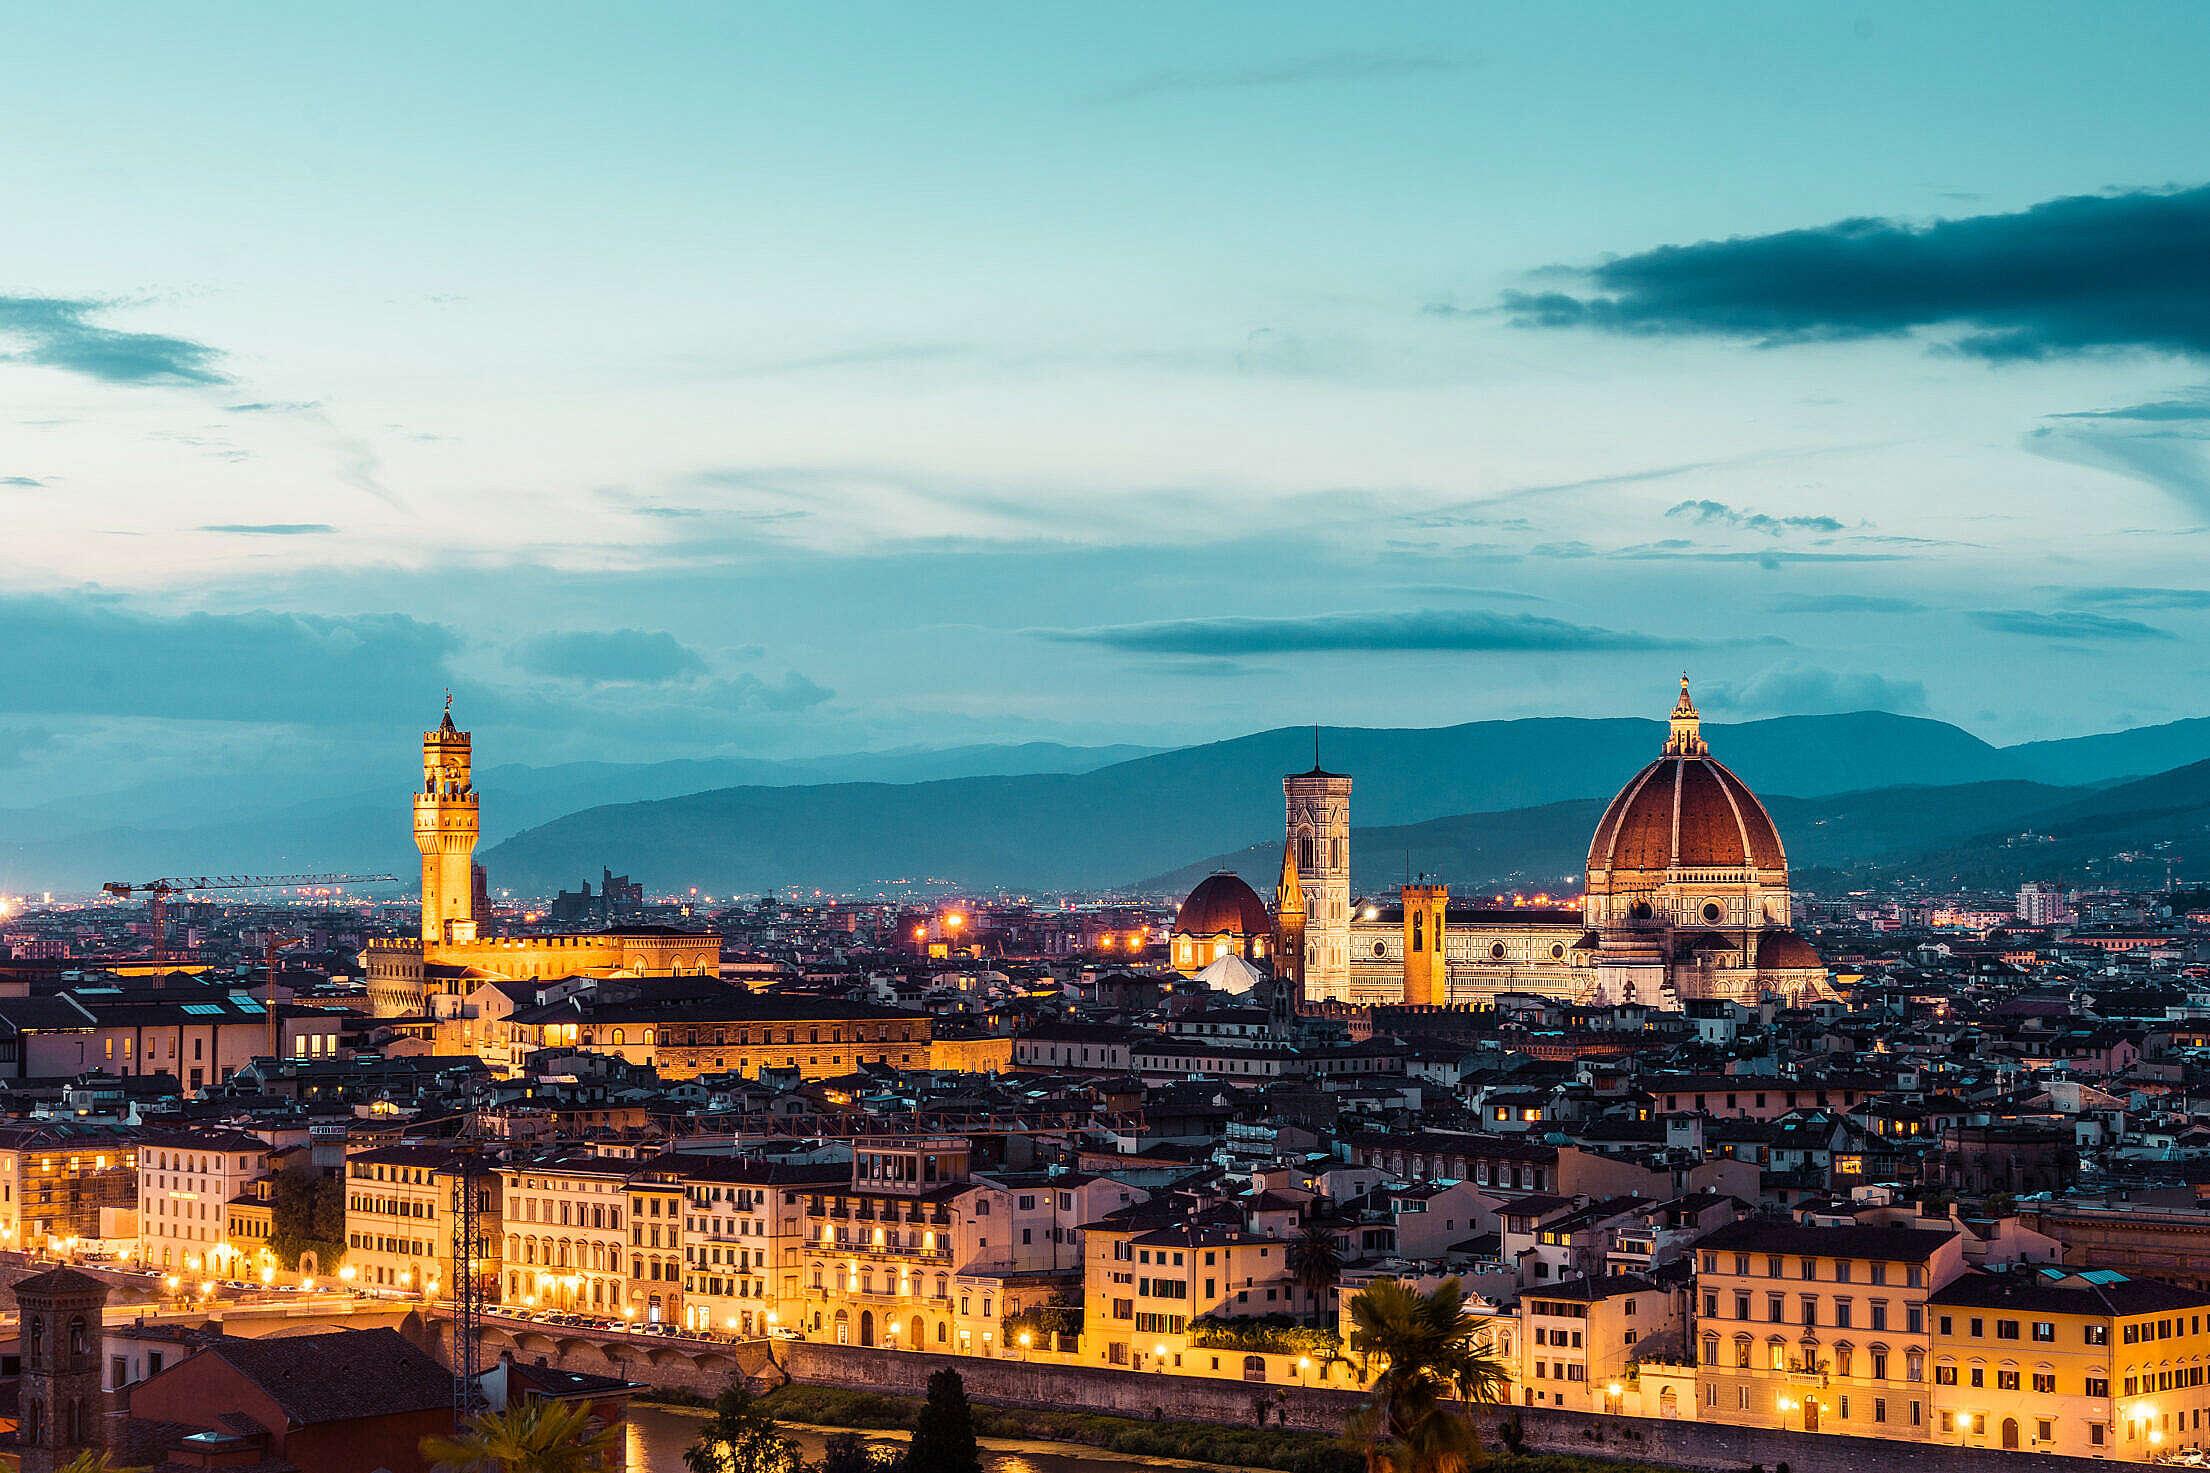 Duomo S. Maria del Fiore and Palazzo Vecchio in the Evening (Florence, Italy) Free Stock Photo